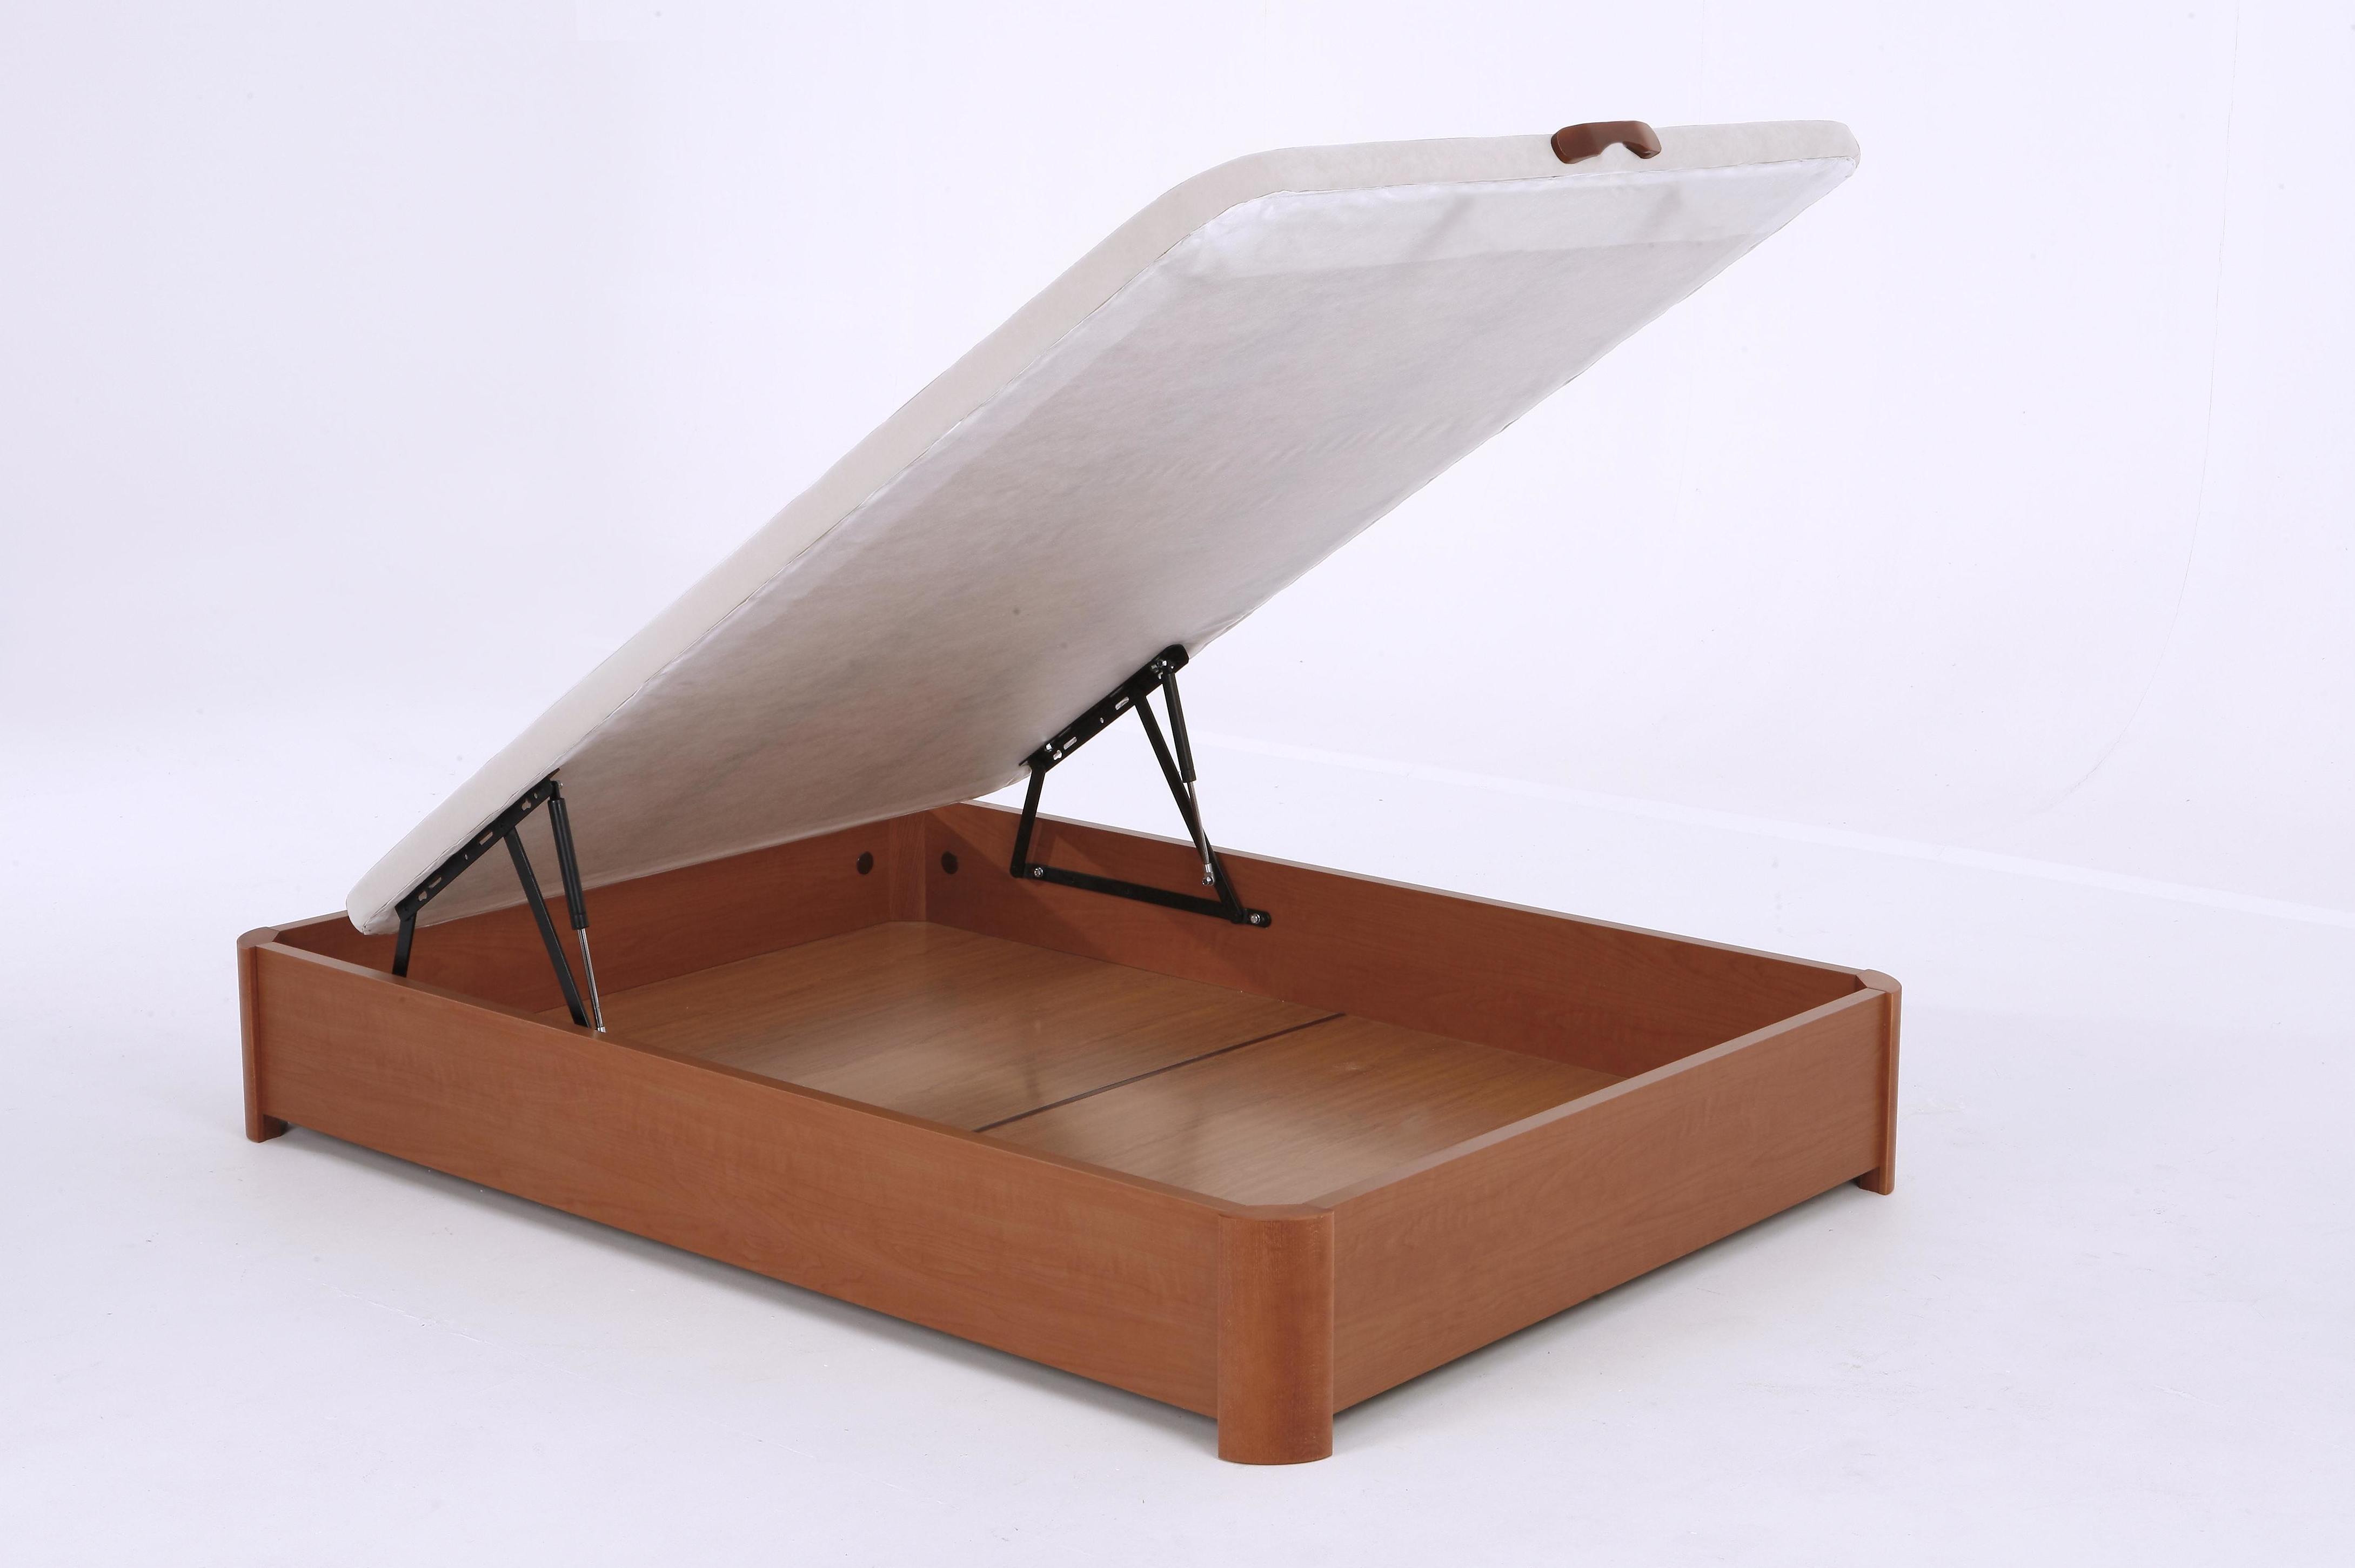 Canapé de madera en varias medidas